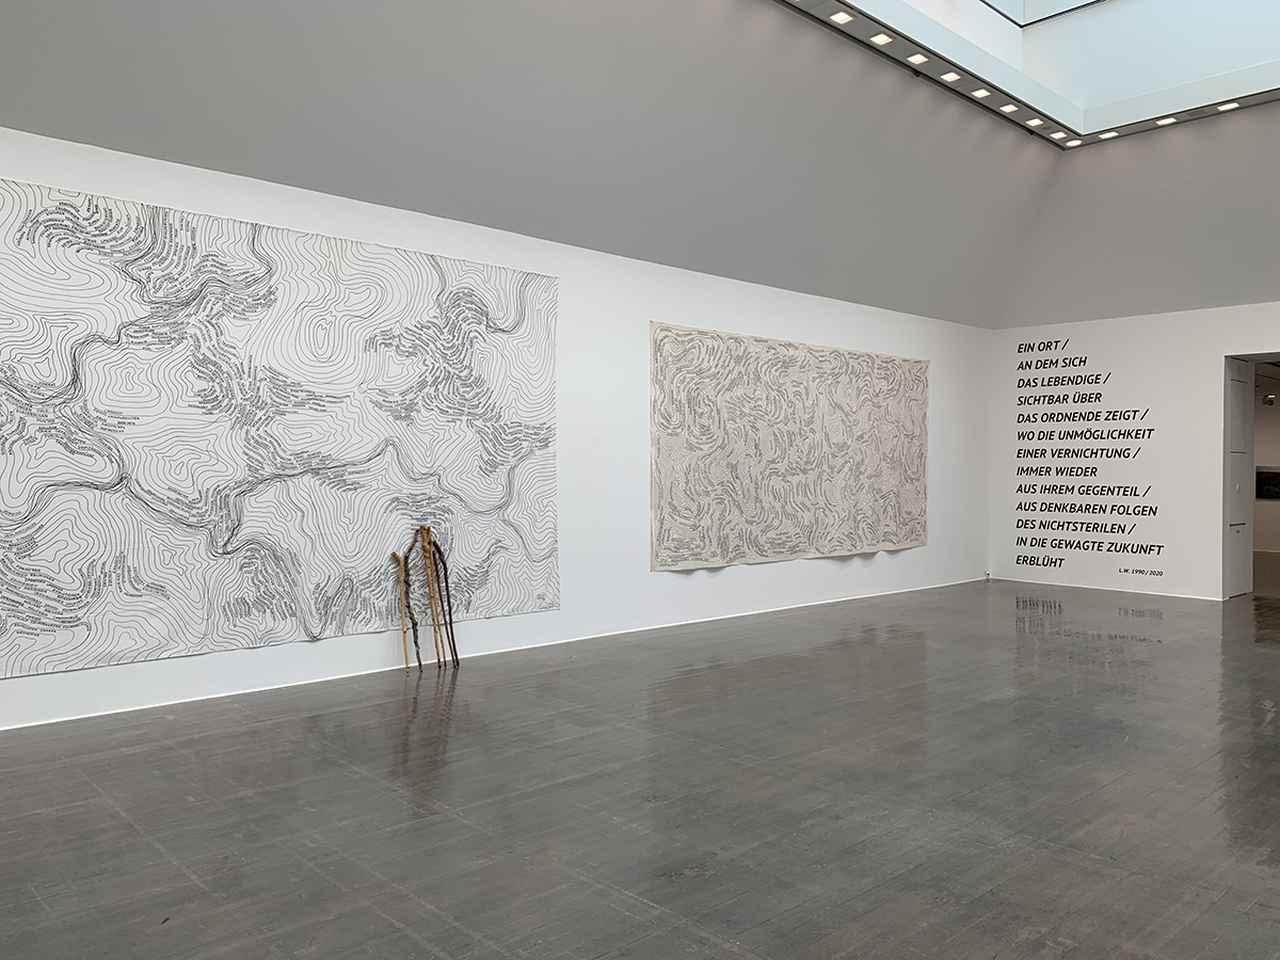 Images : 道草展:未知とともに歩む 水戸芸術館 現代美術ギャラリー